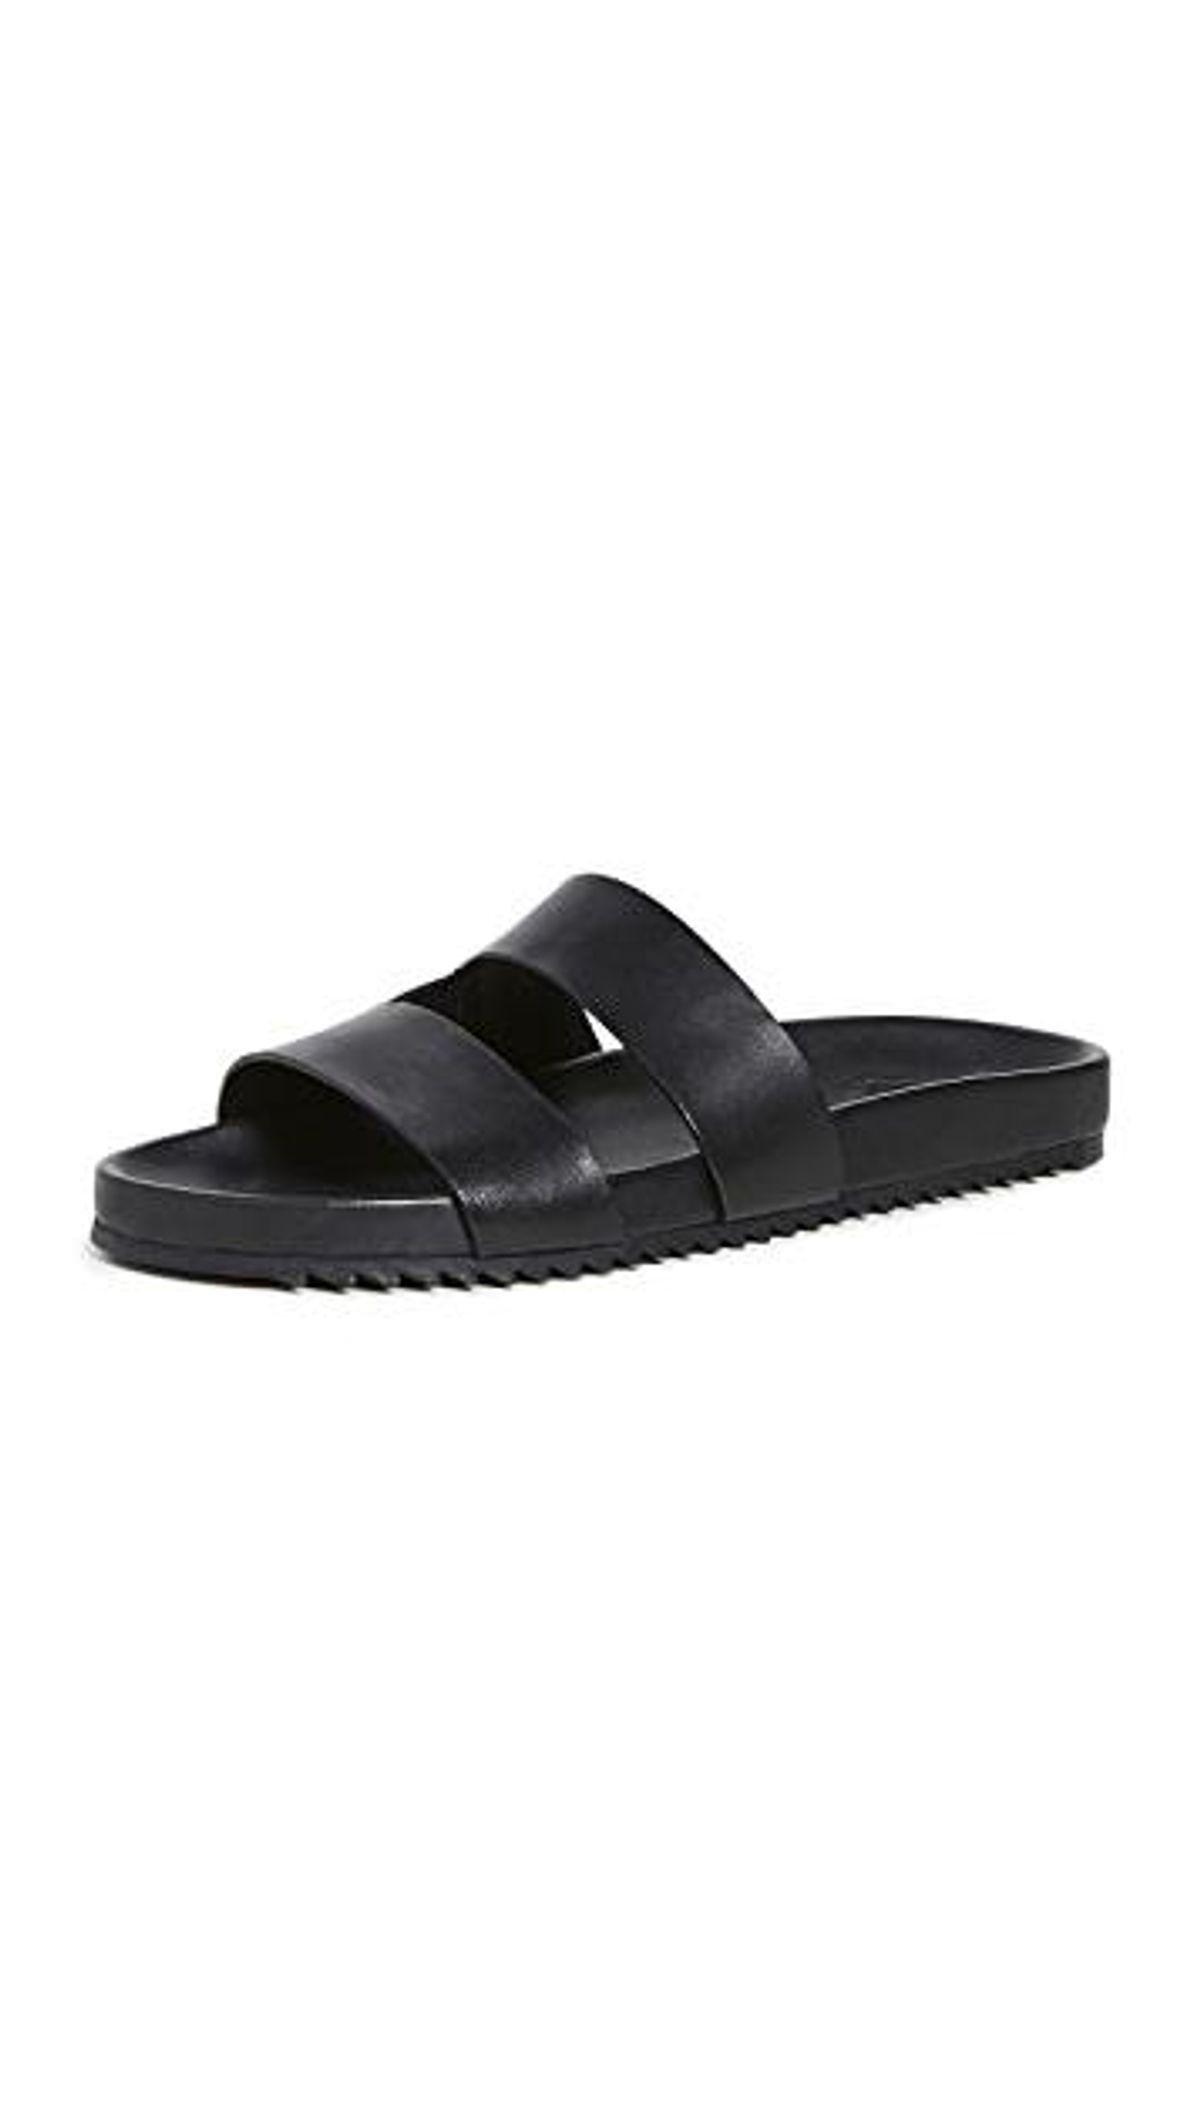 Chadwick Sandals